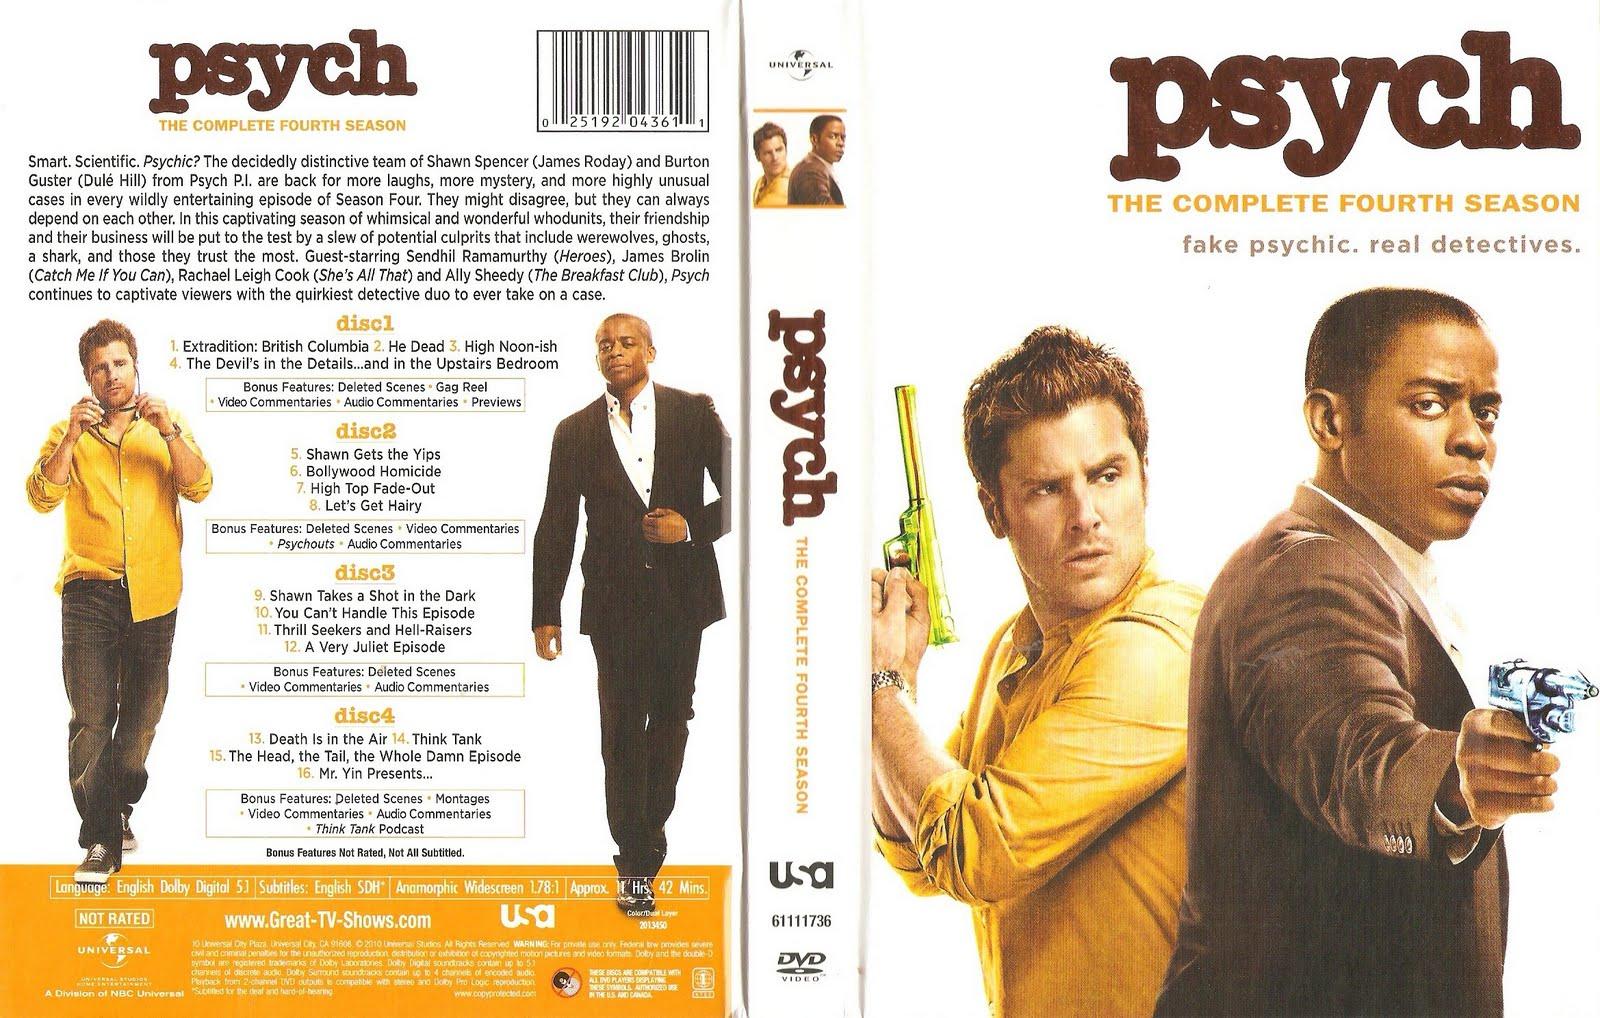 Psych Season 2 4 Dvds Jpc - Www imagez co